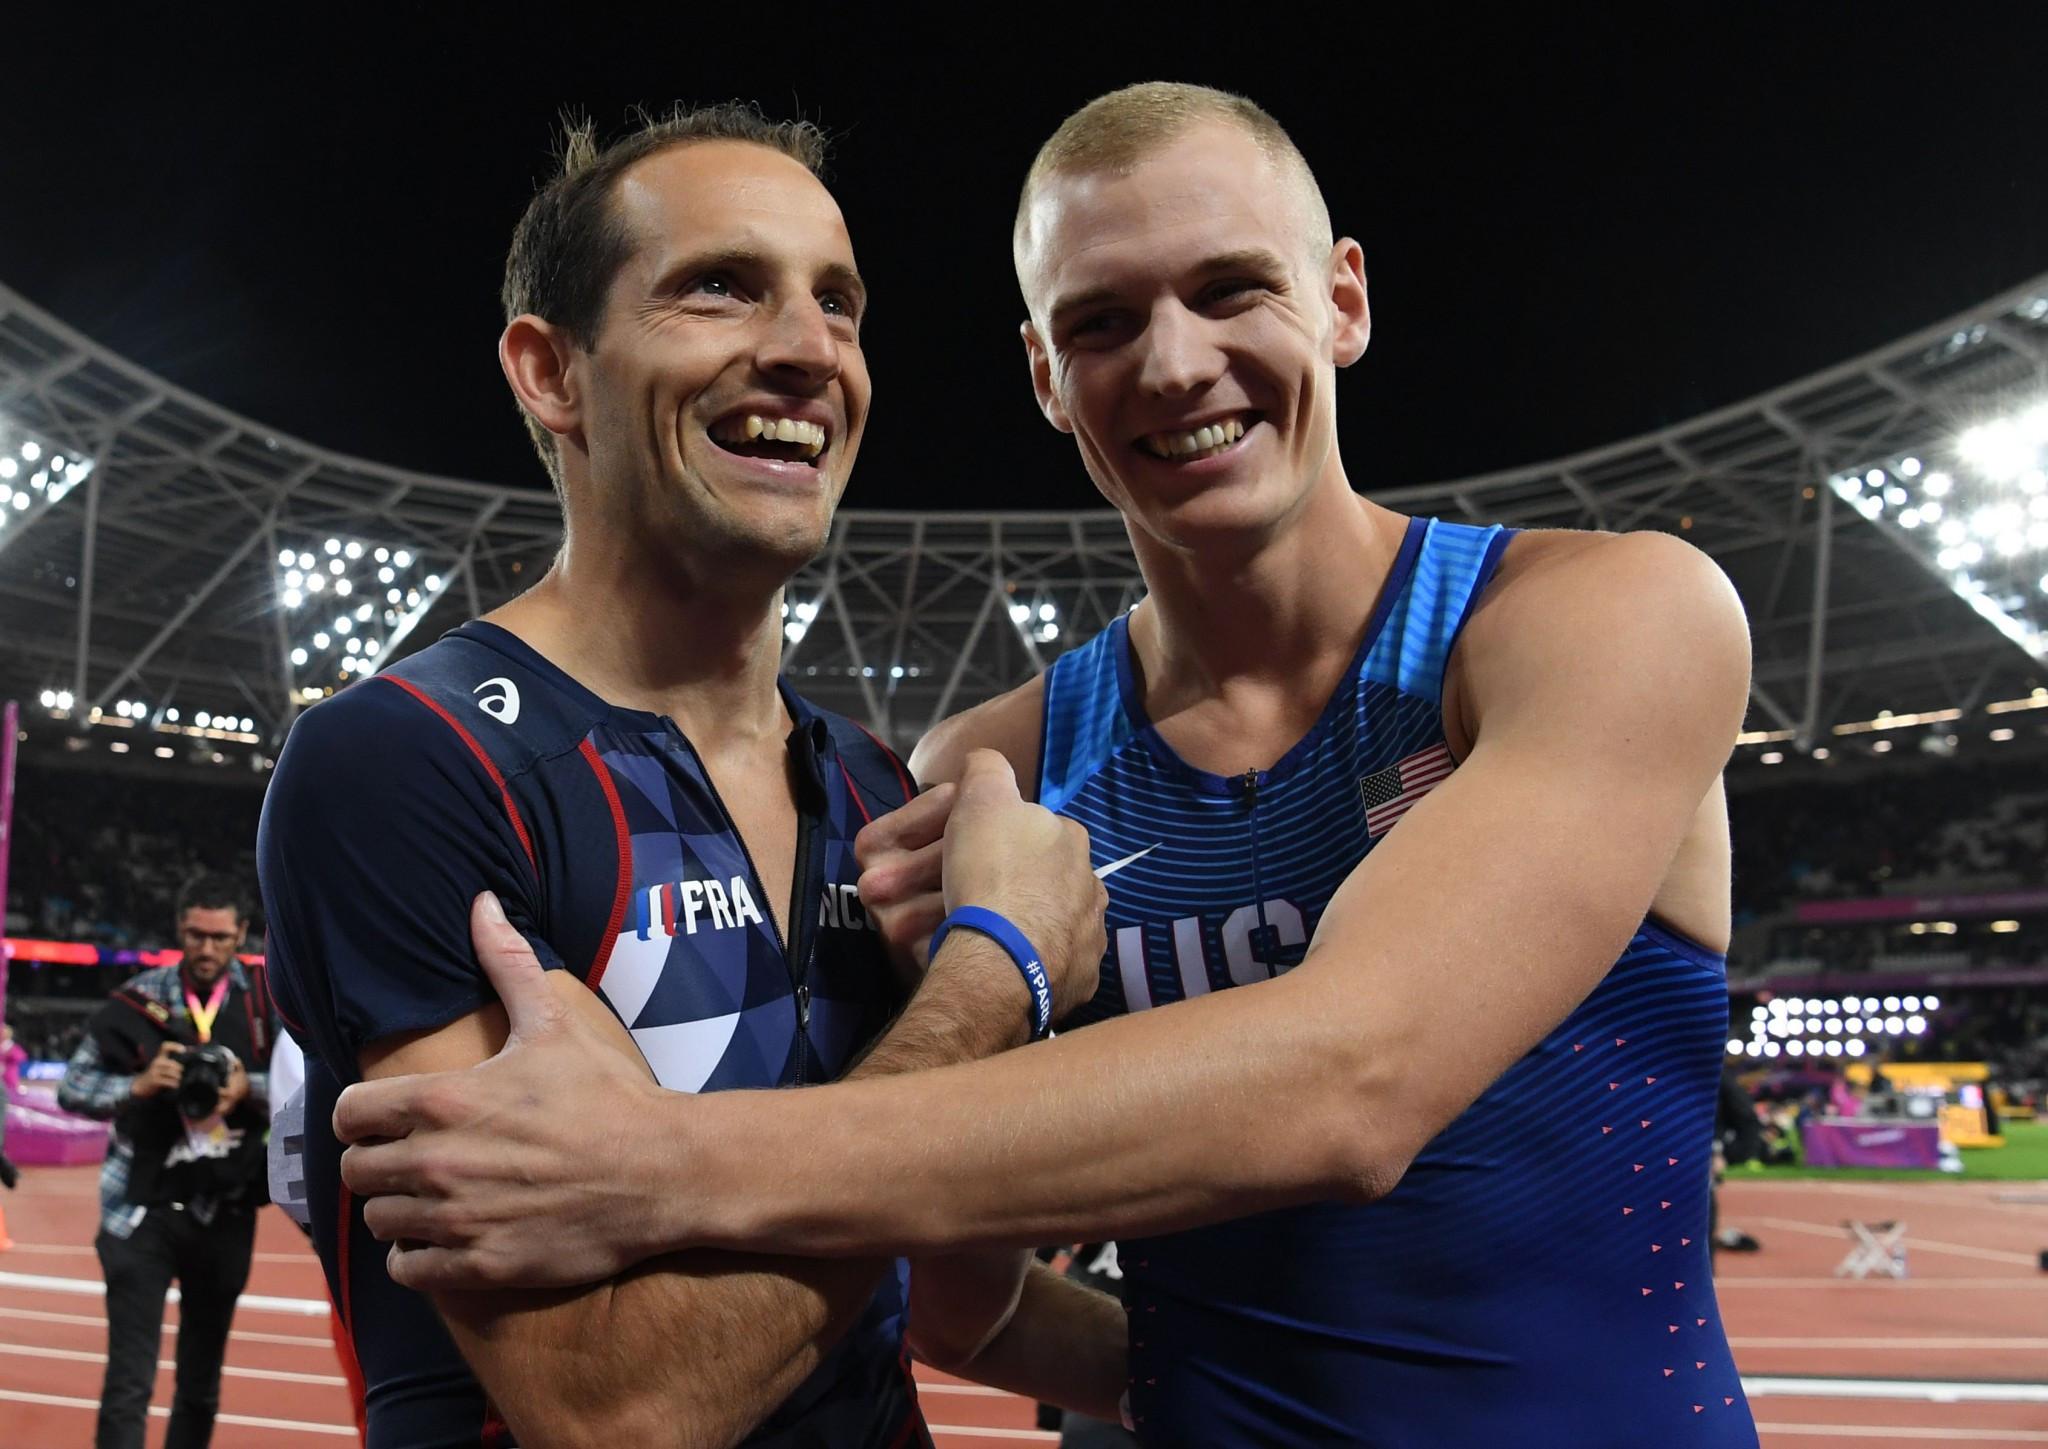 Kendricks wins men's pole vault title at athletics worlds